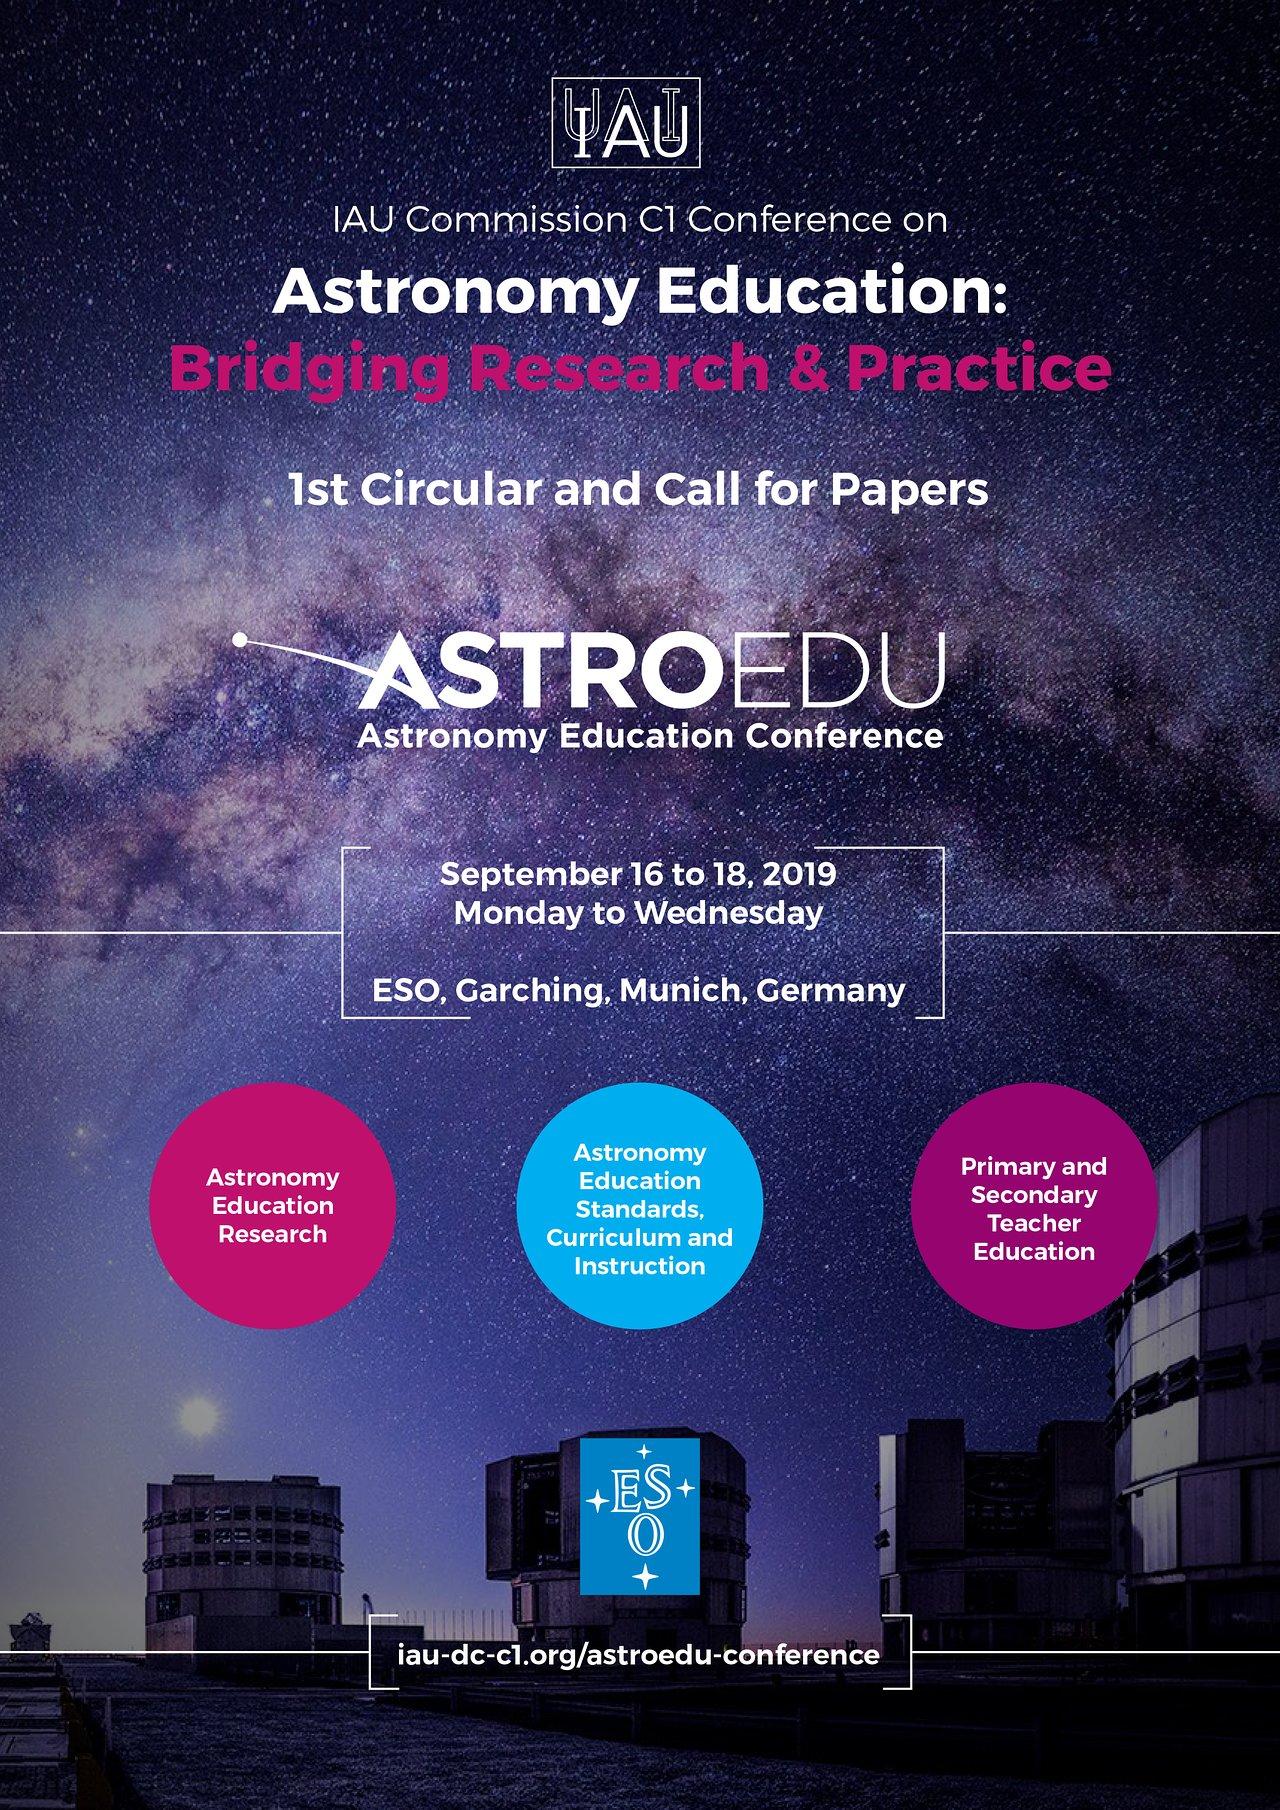 IAU Astronomy Education Conference comes to ESO Supernova | ESO